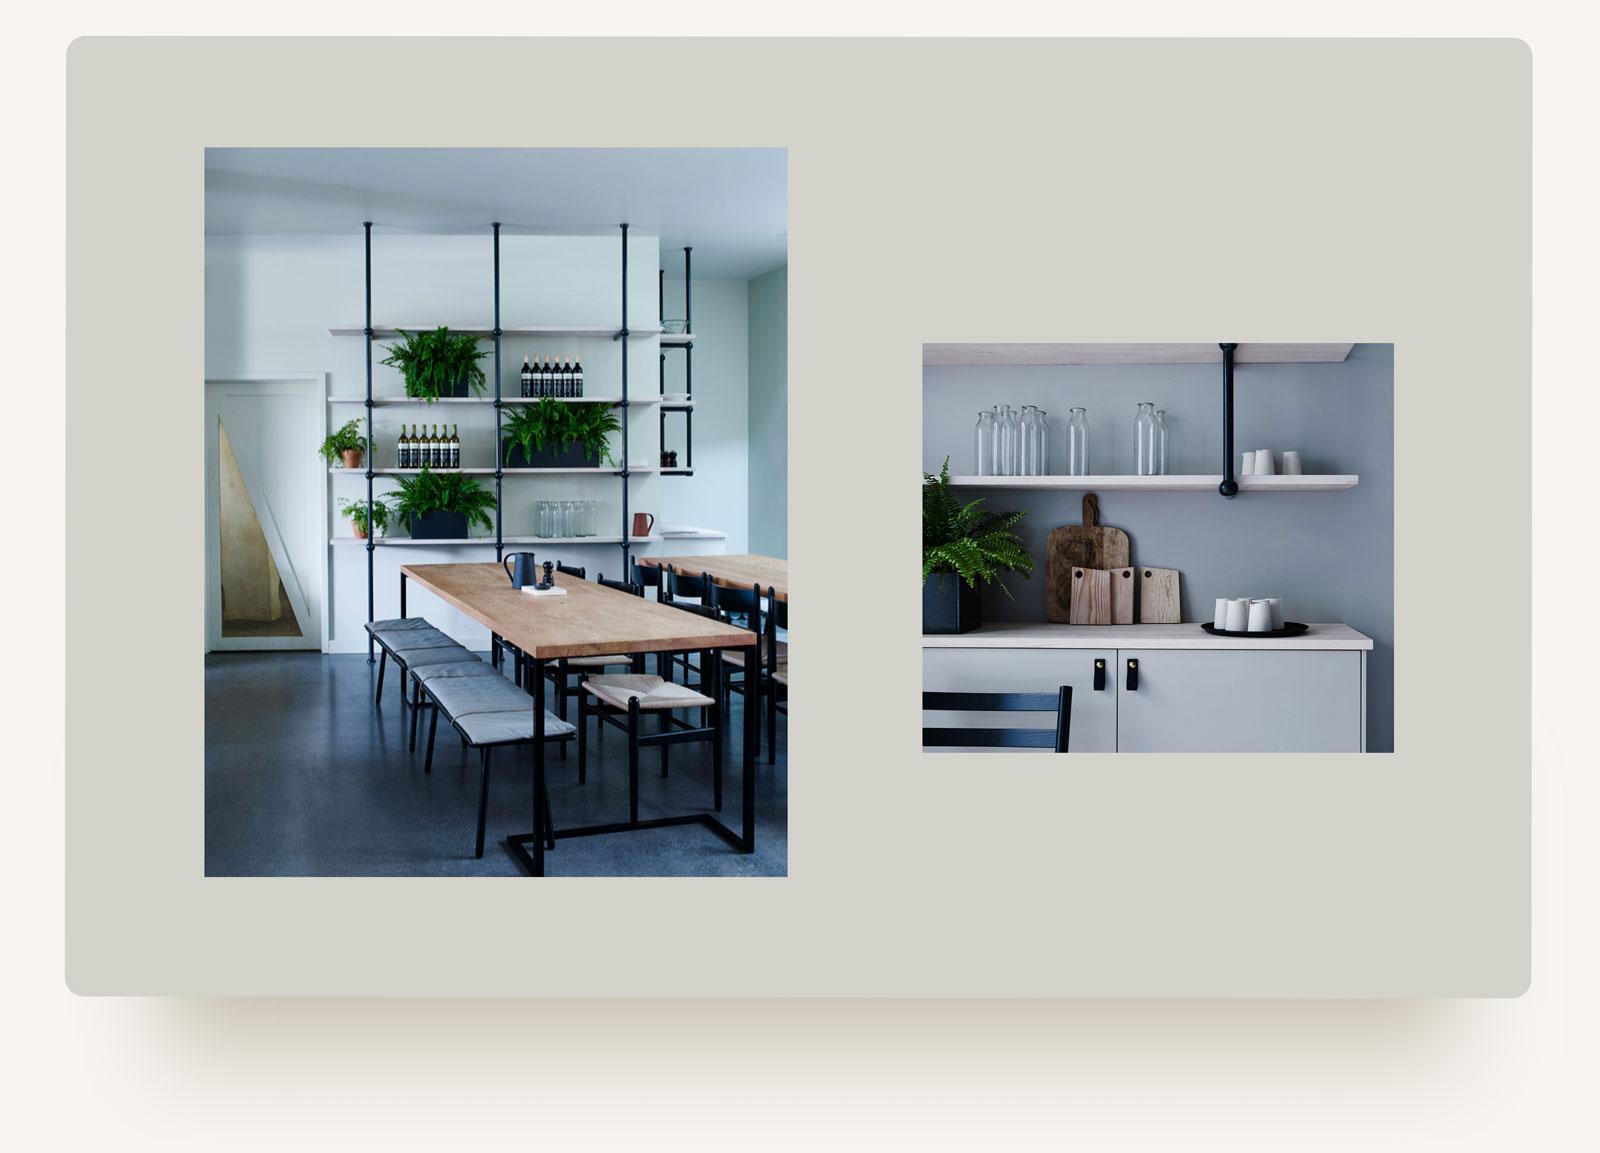 House of Grey interiors studio restaurant portfolio layout. Squarespace web design and custom build development by Brittany Hurdle beckon webeckon